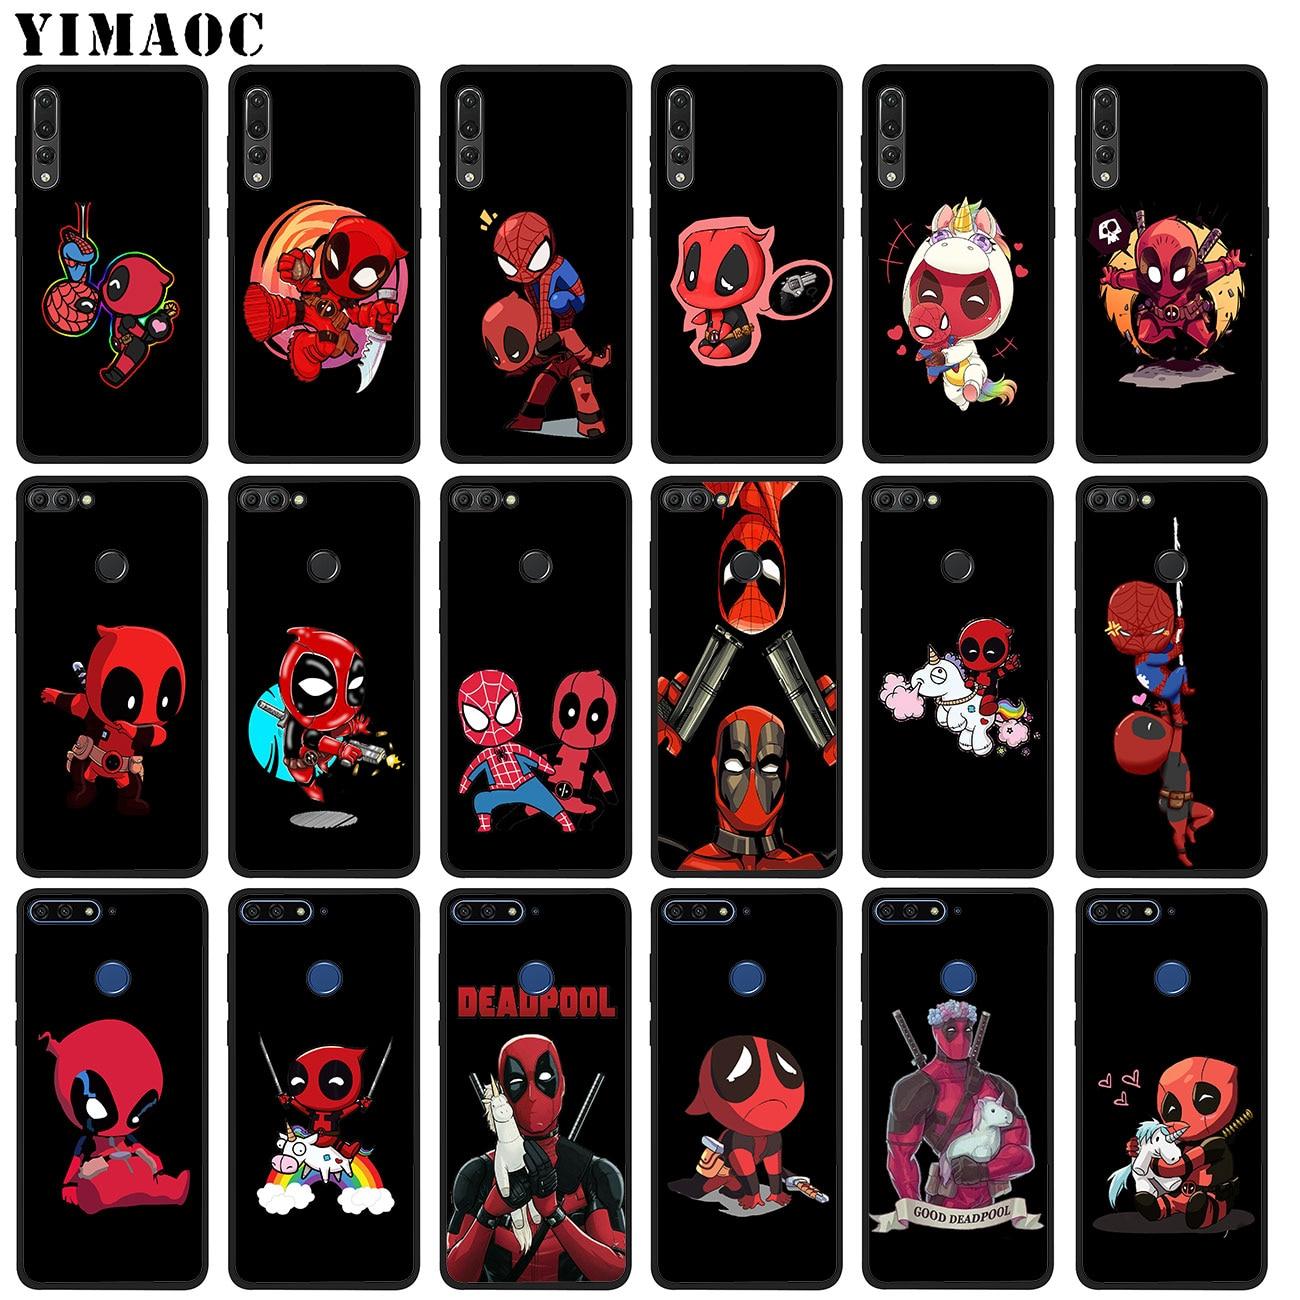 YIMAOC Marvel unicornio divertido Deadpool suave de silicona caso para Huawei P20 Pro P10 P9 P8 Lite Mini 2017 P Smart Z 2019 cubierta de TPU